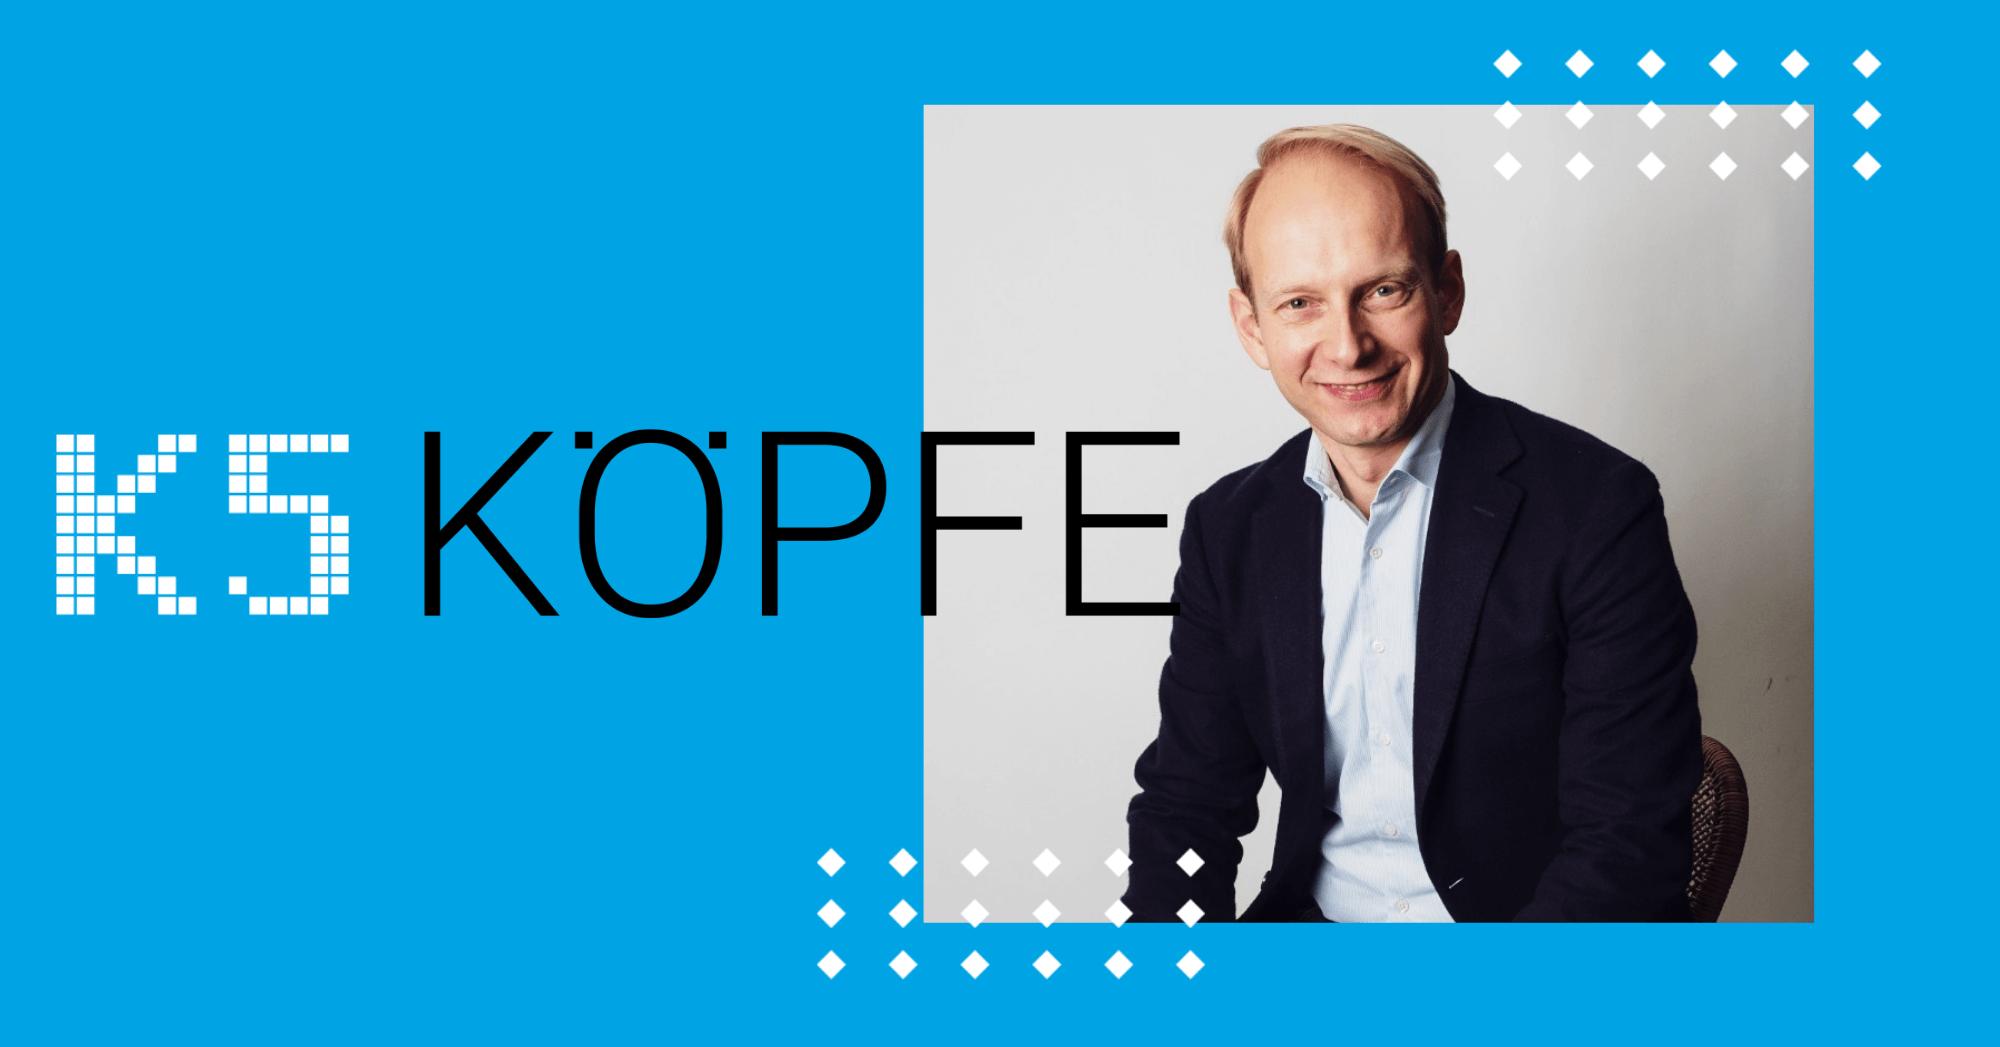 K5 Köpfe Christoph Barchewitz